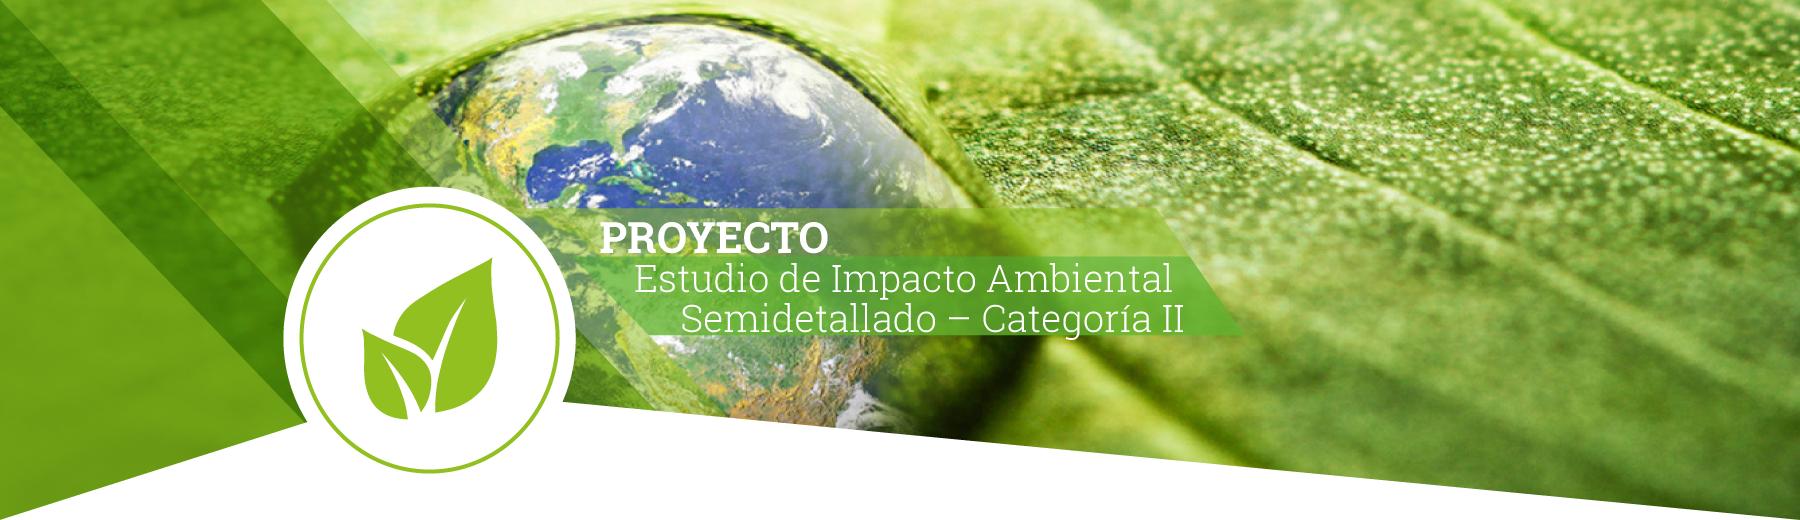 proyecto3-1